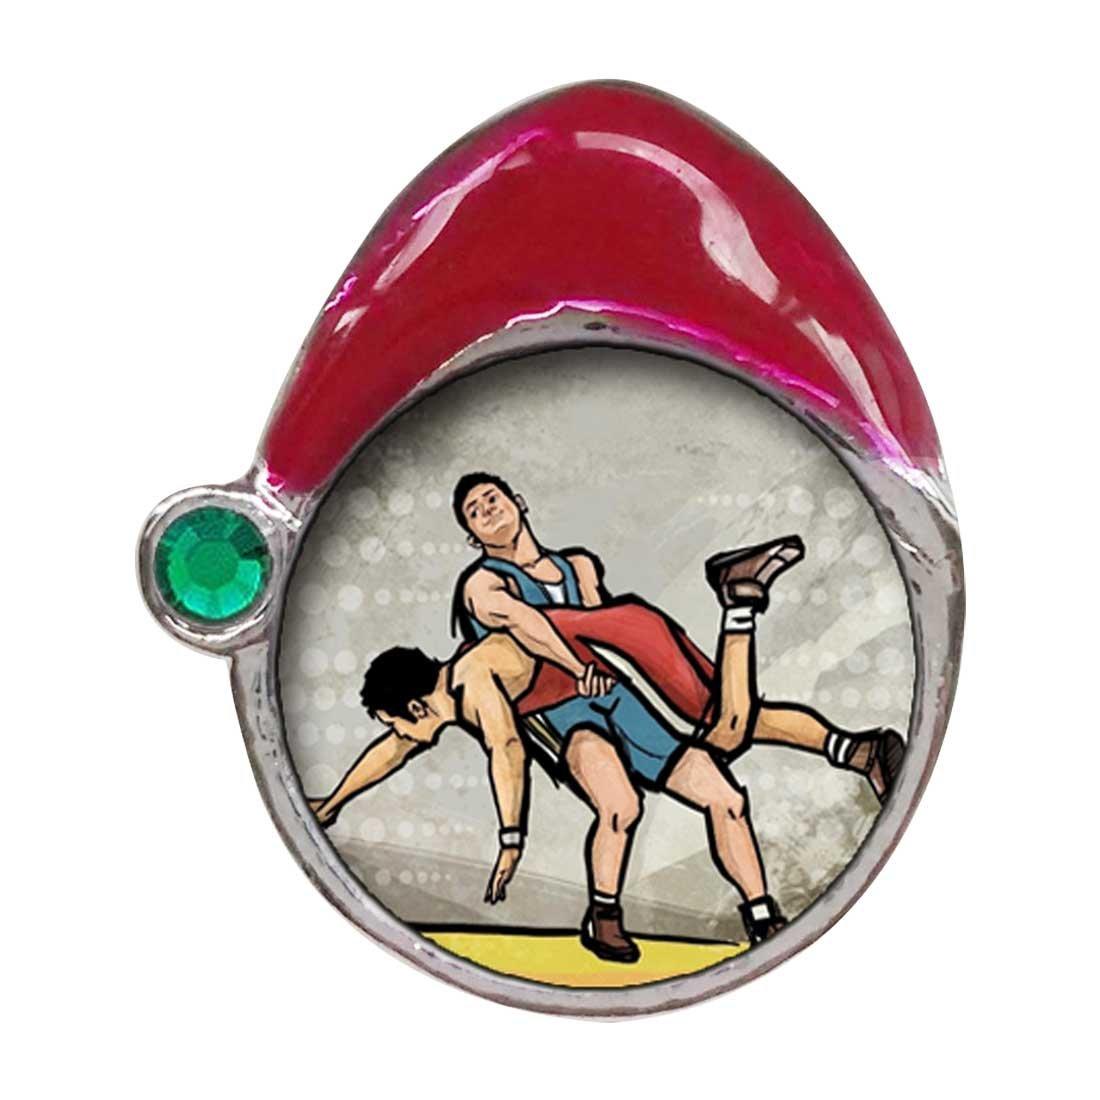 Olympics Wrestling Emerald Green Crystal May Birthstone Red Santa Hat Charm Bracelets